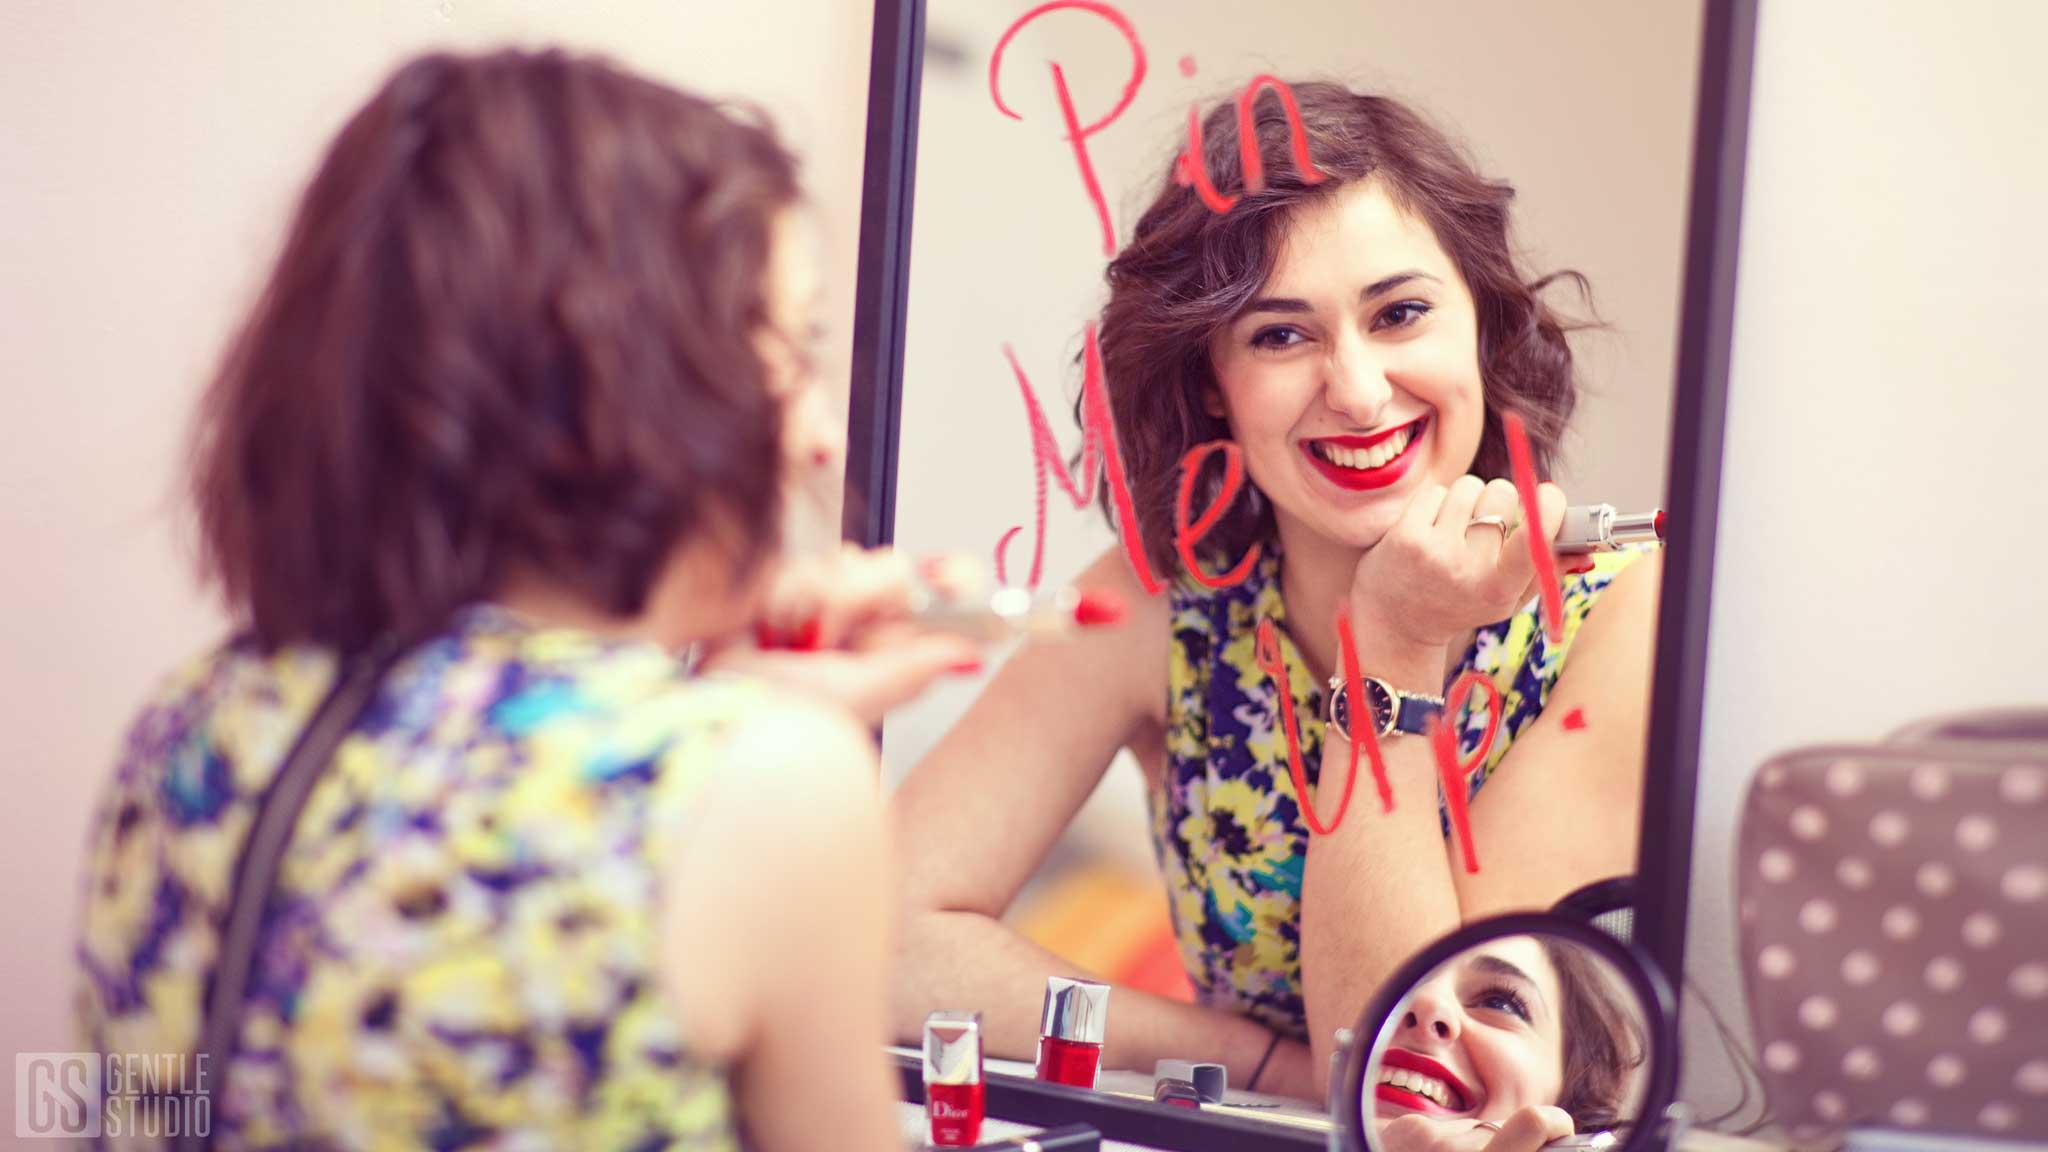 photographe portrait pin up pin me up pinterest red lipstick gentle studio french photographer nancy metz strasbourg lorraine